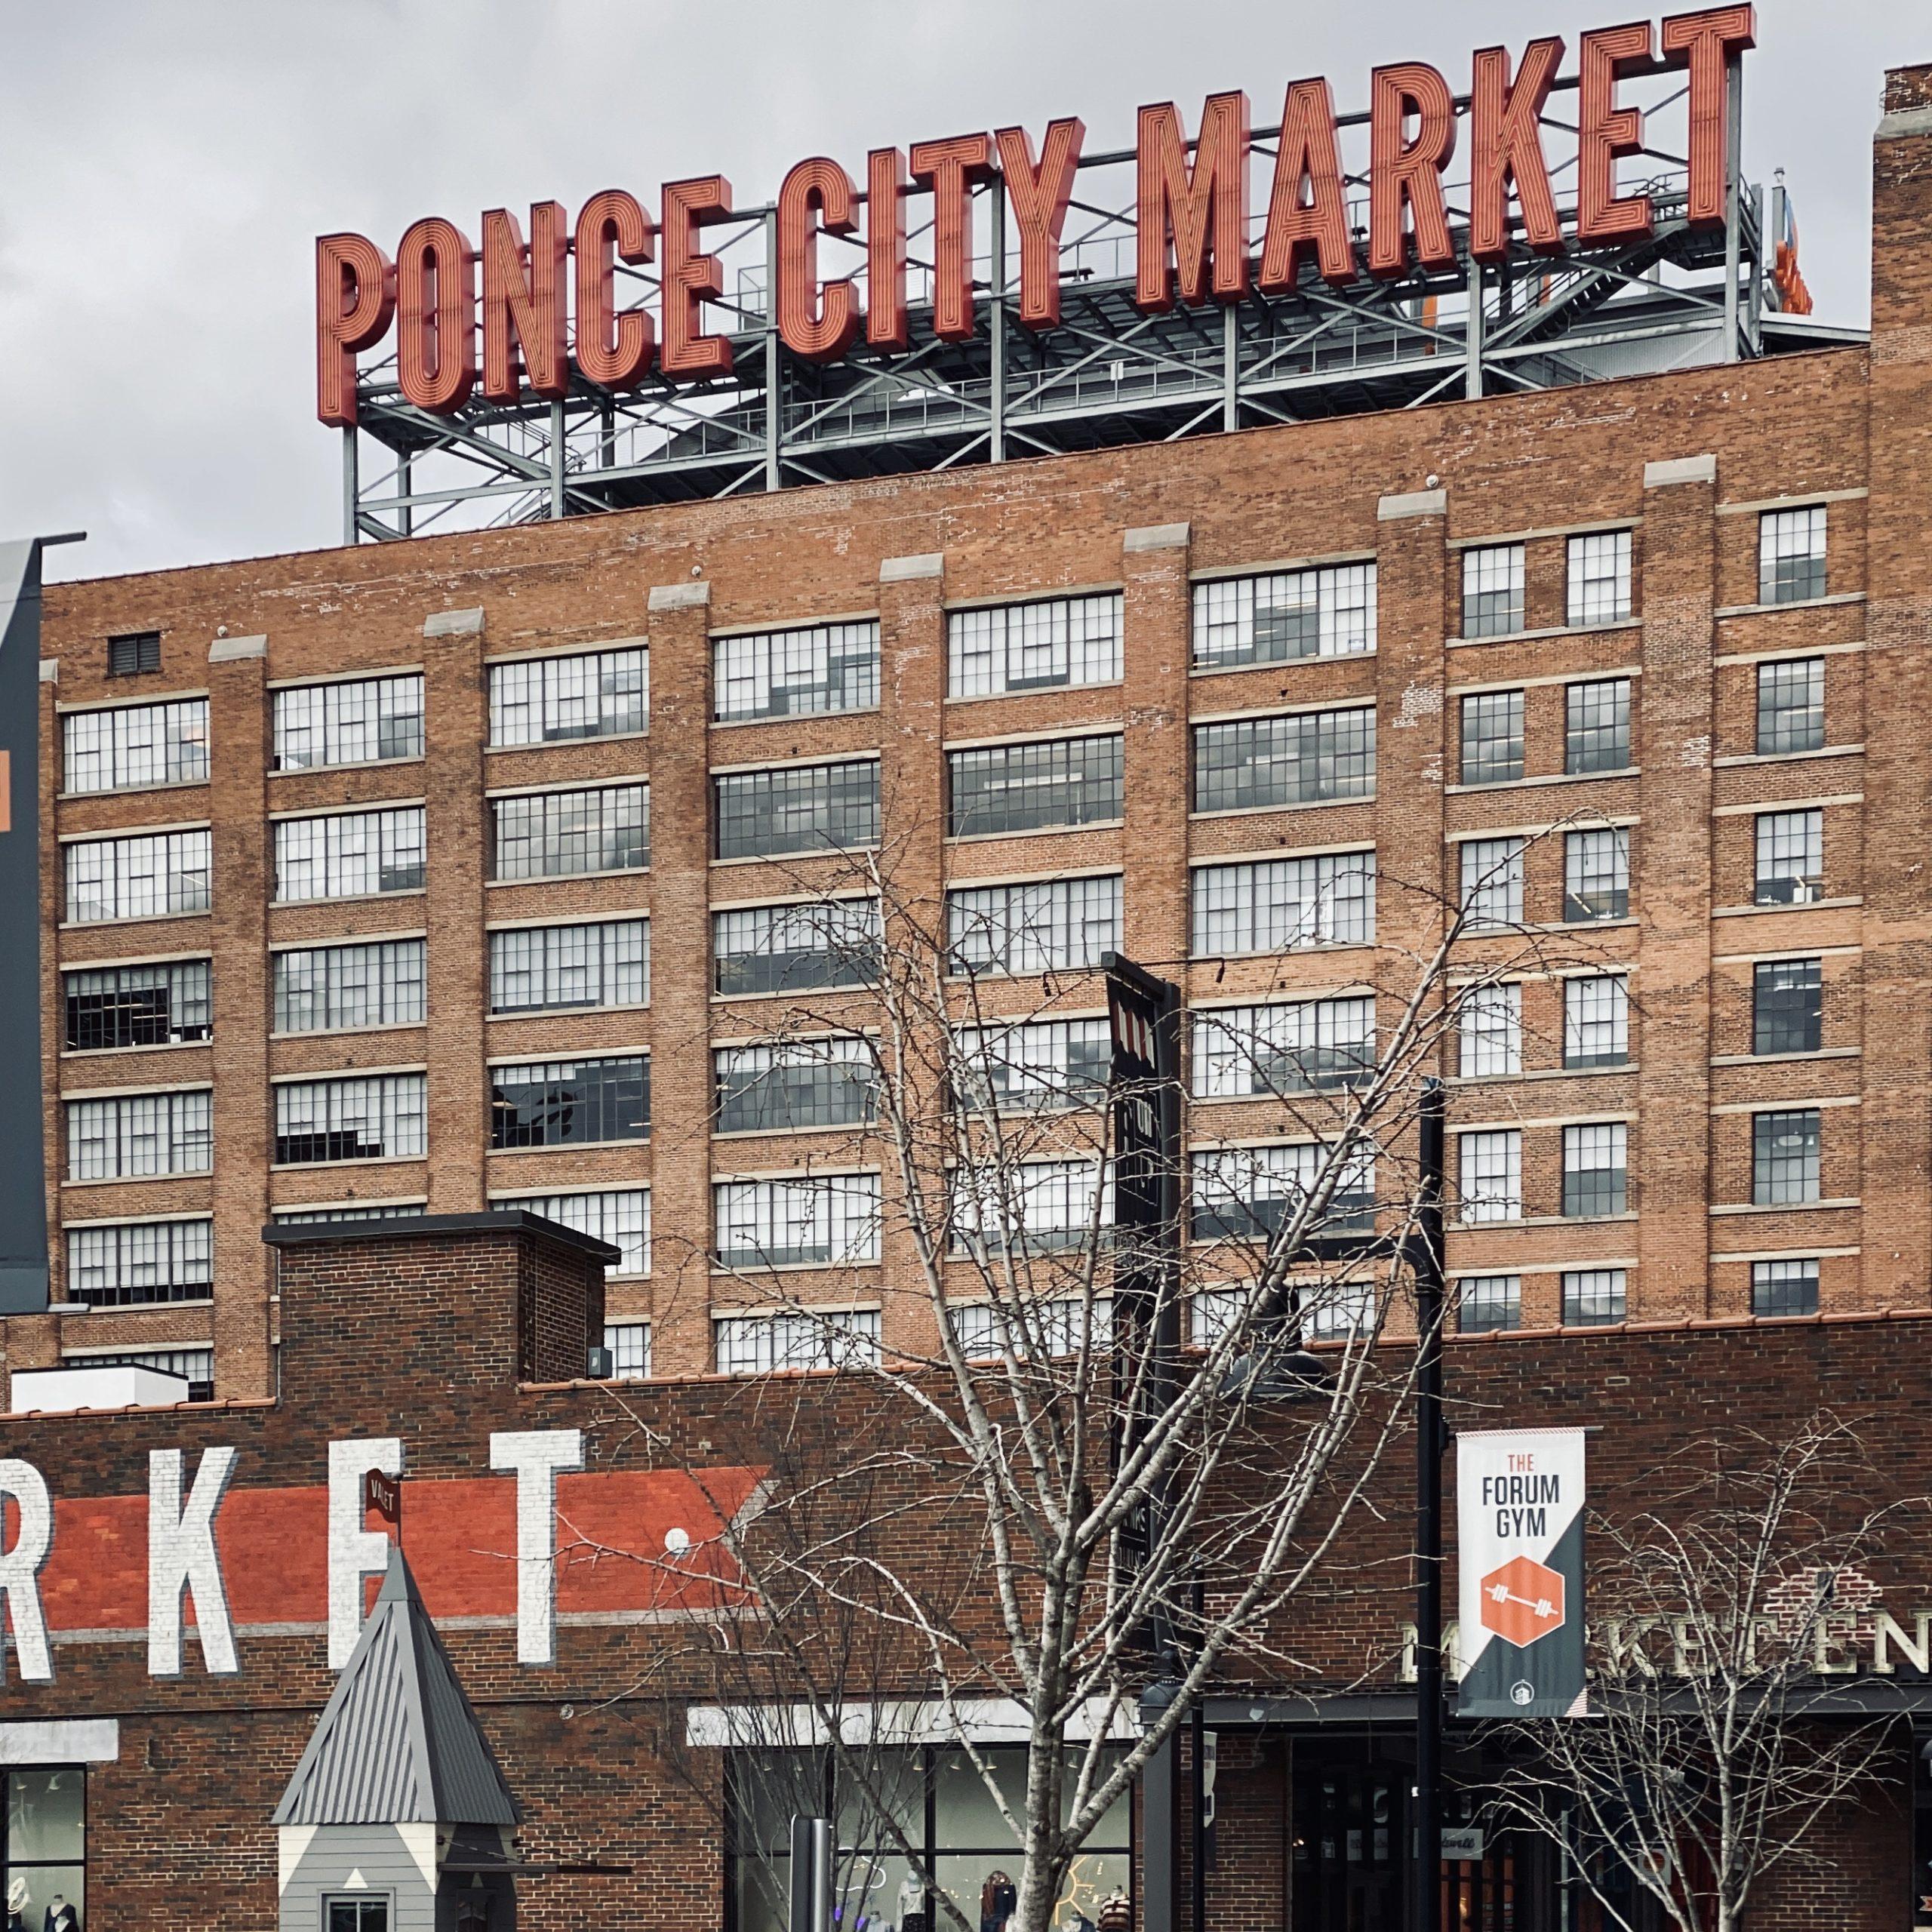 ponce city market, atl, Atlanta, Atlanta shopping, travel, wanderlust